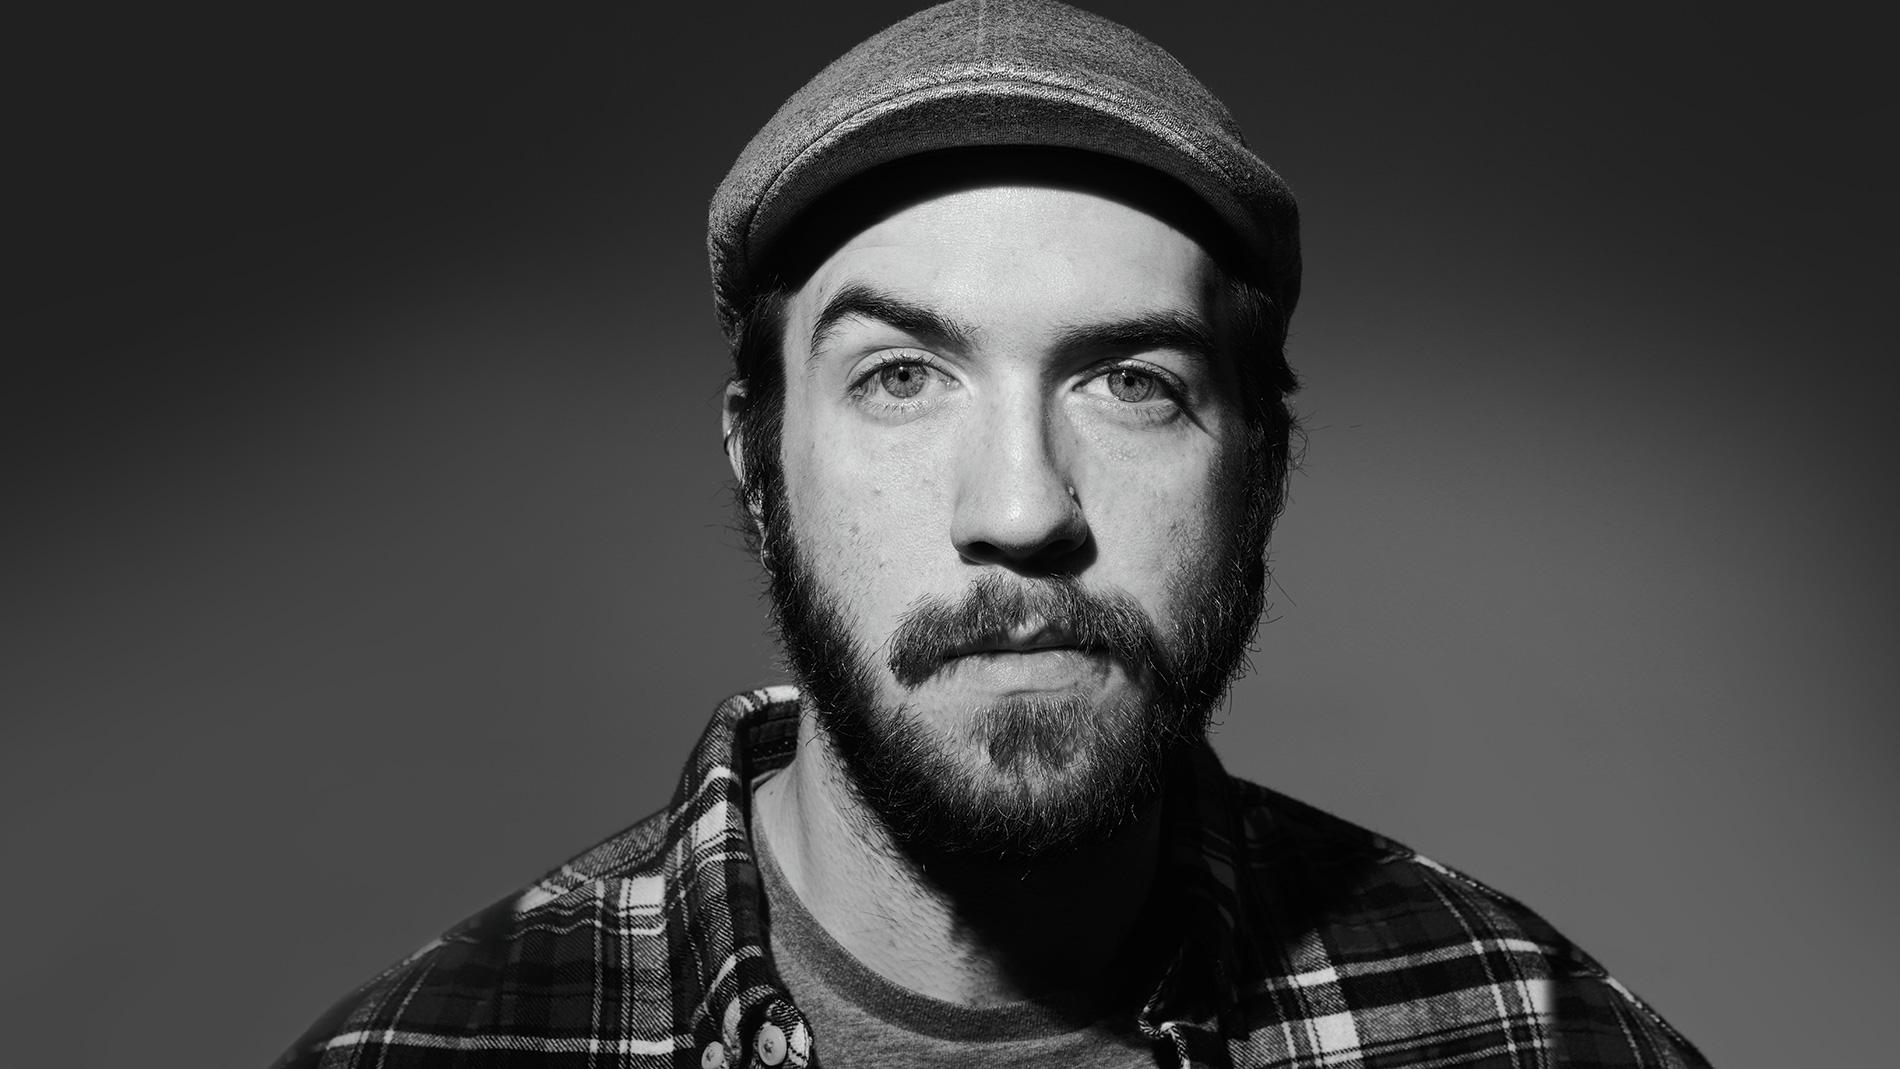 a man with a beard and a cap